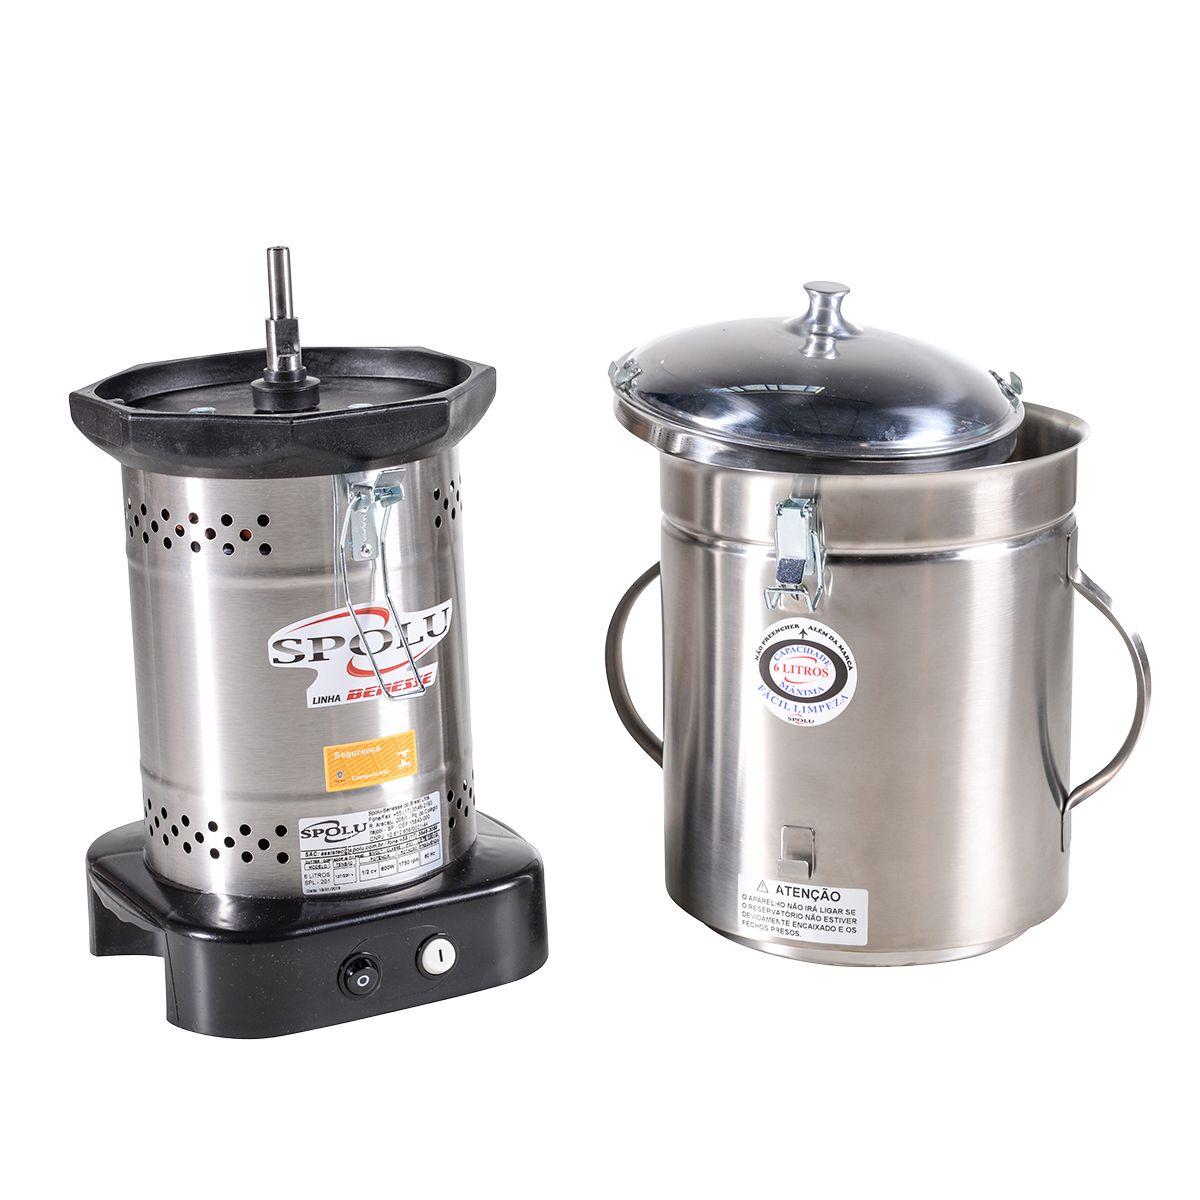 Processador De Alimentos Industrial Cutter 6 Litros 600W Spl201 - Spolu